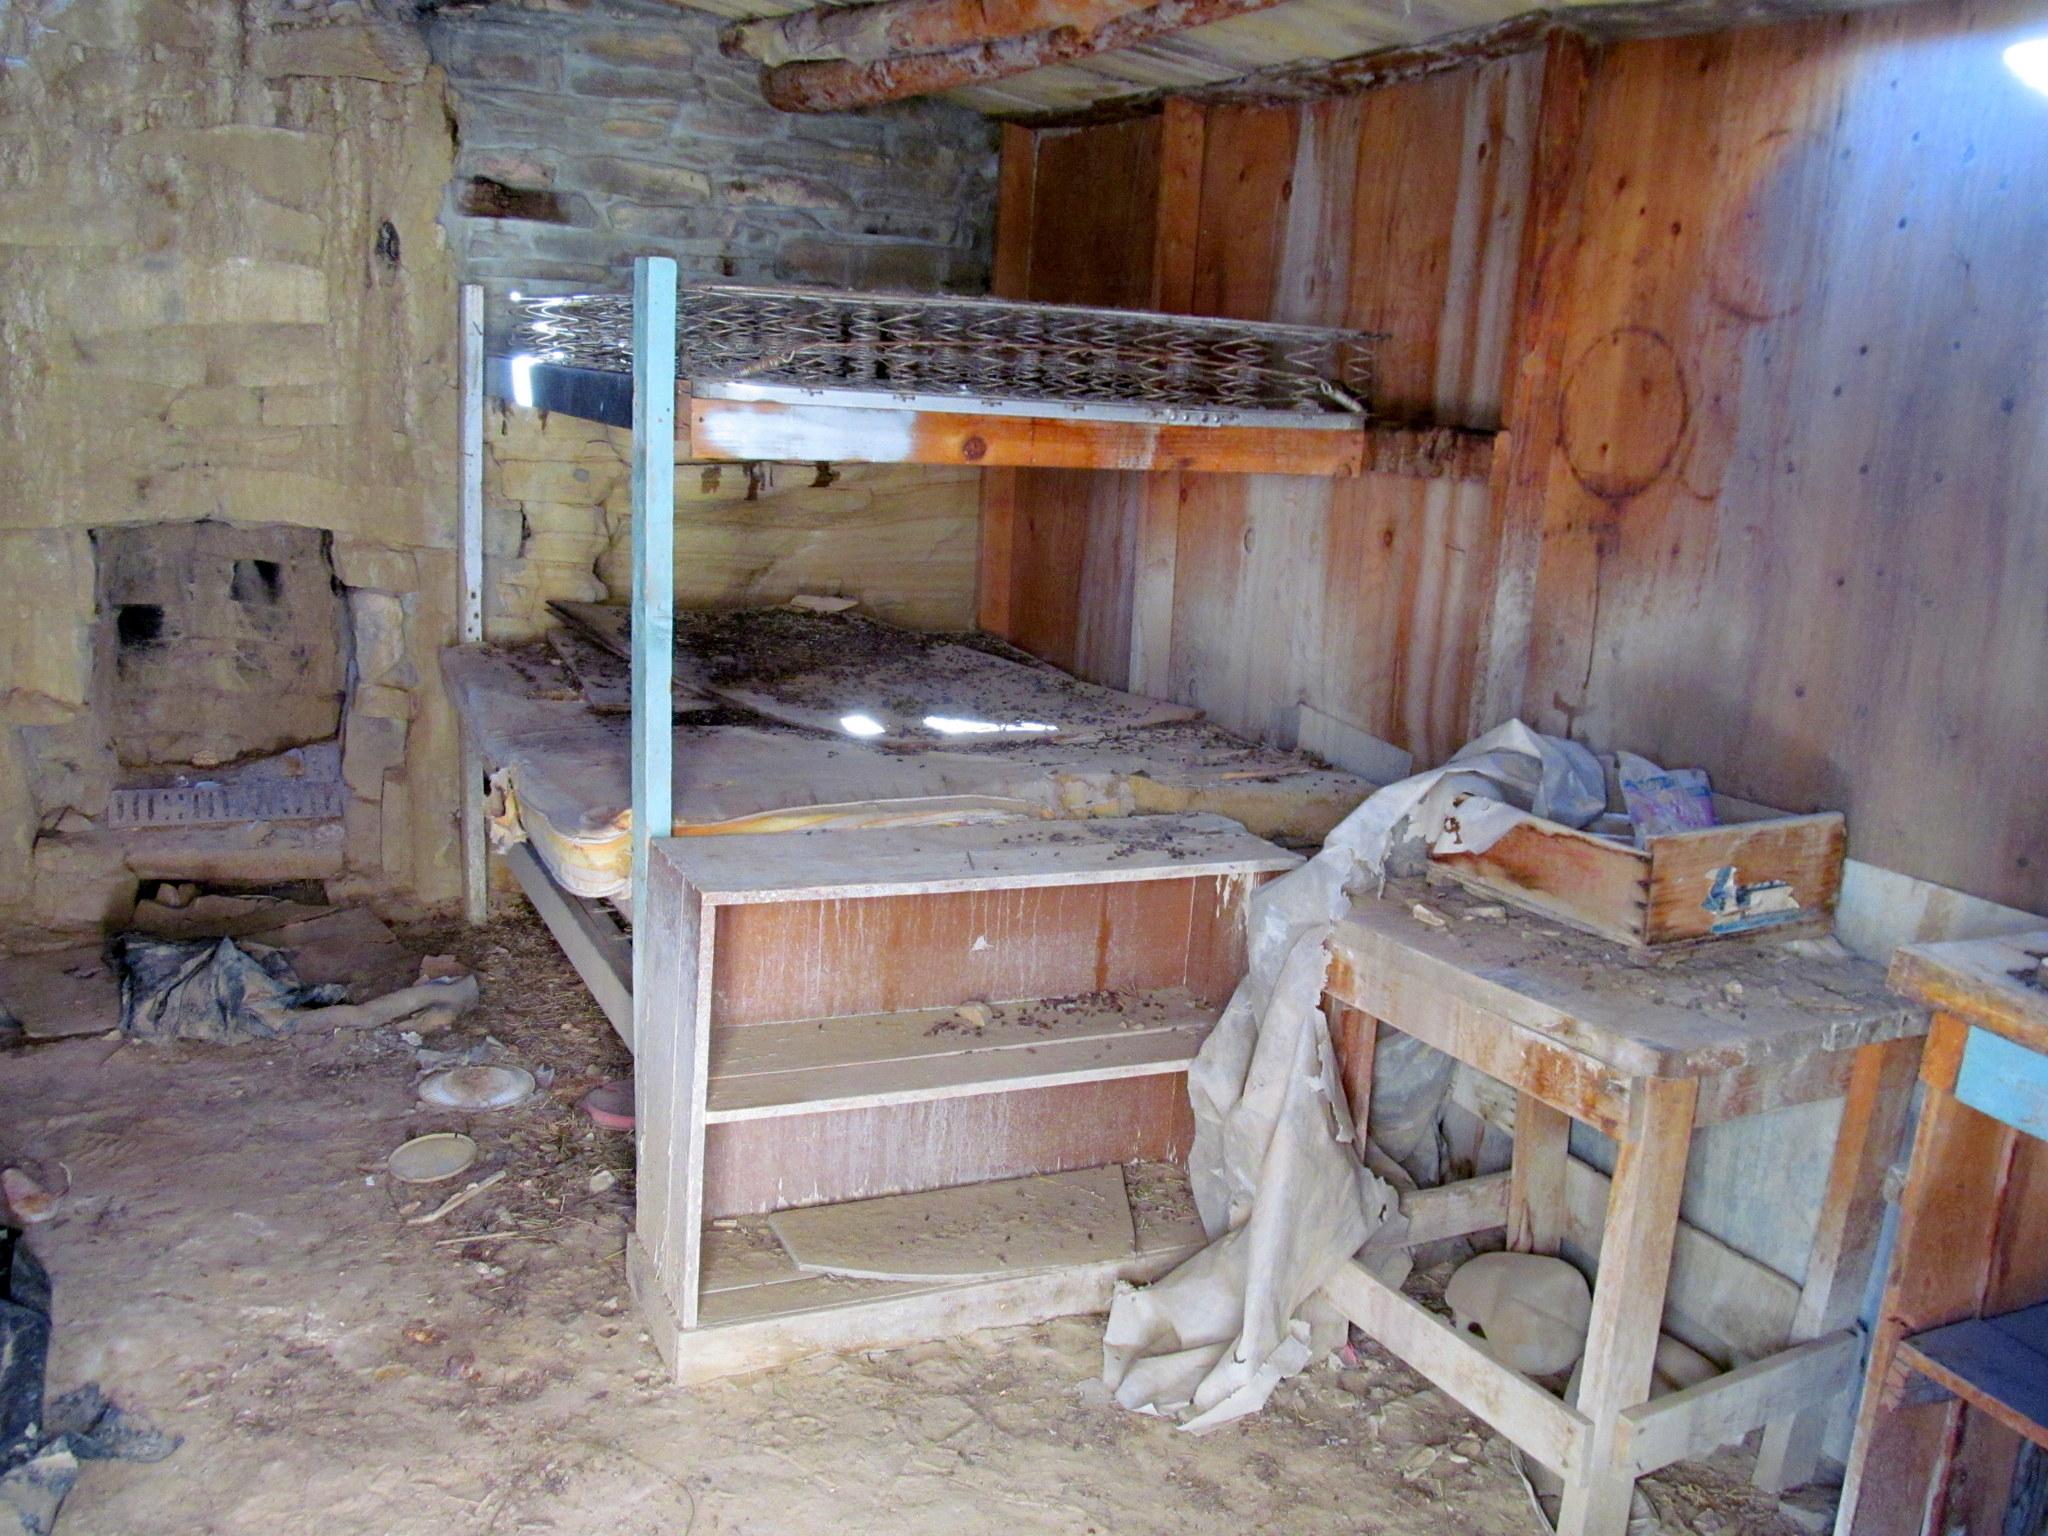 Photo: Bunks in the cabin